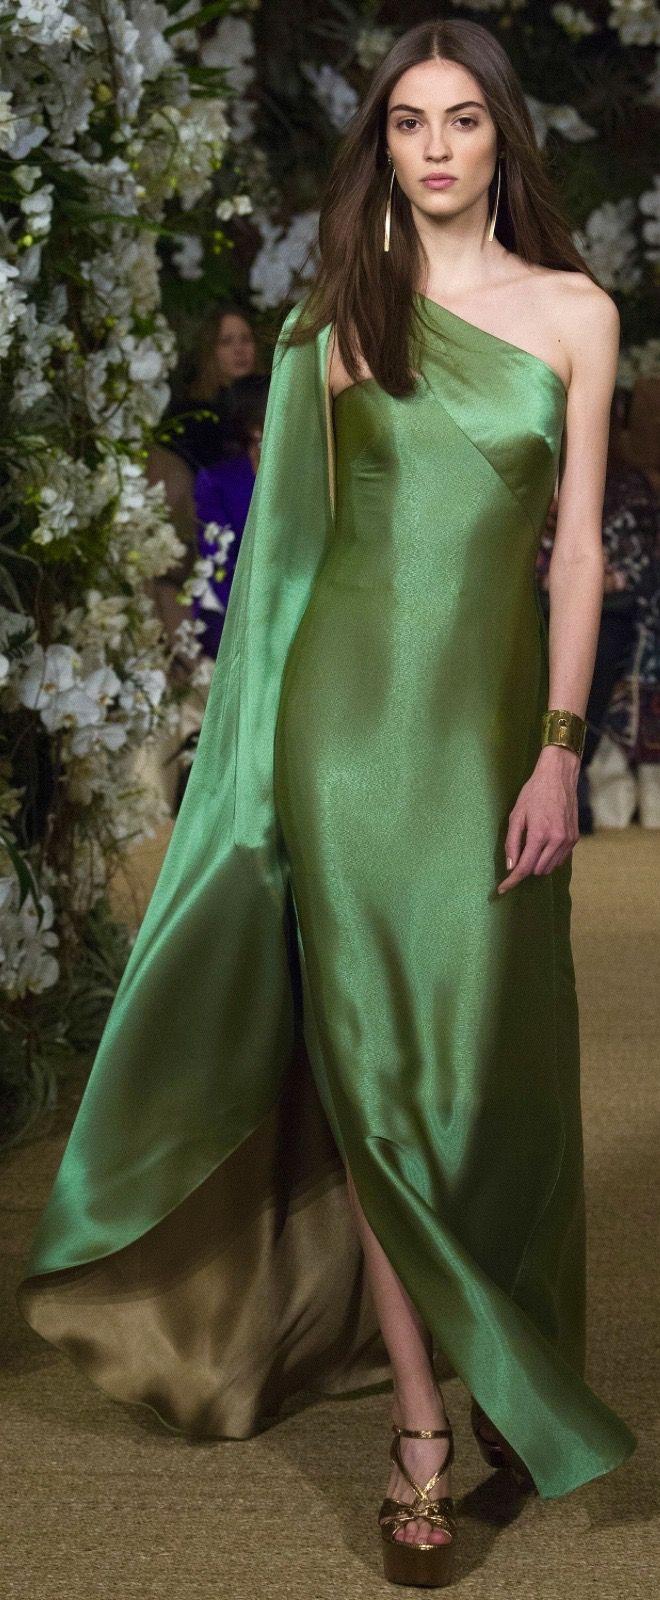 Ralph lauren fall things to wear pinterest gowns envy